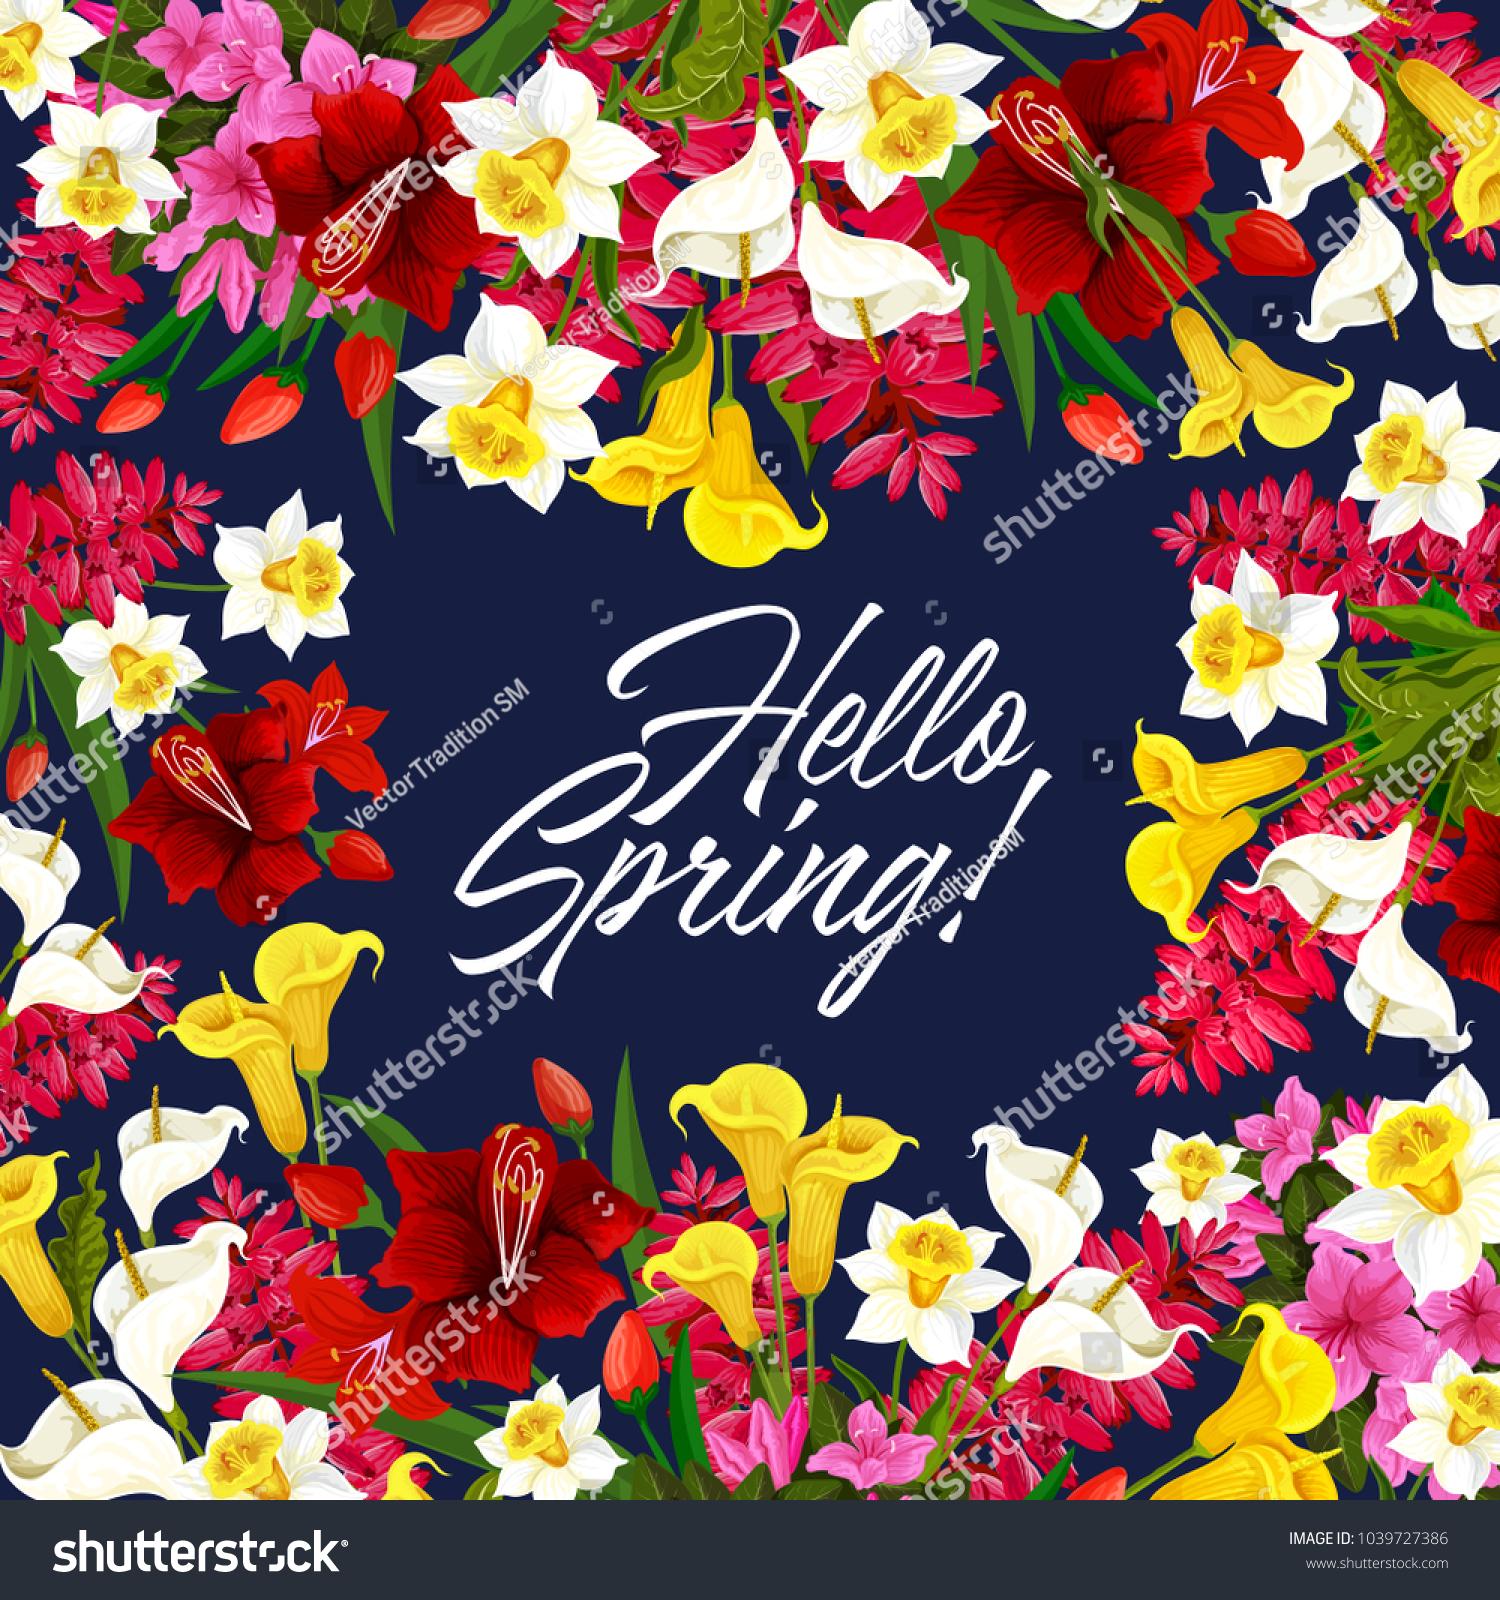 Hello Spring Floral Poster Garden Blooming Stock Vector Royalty